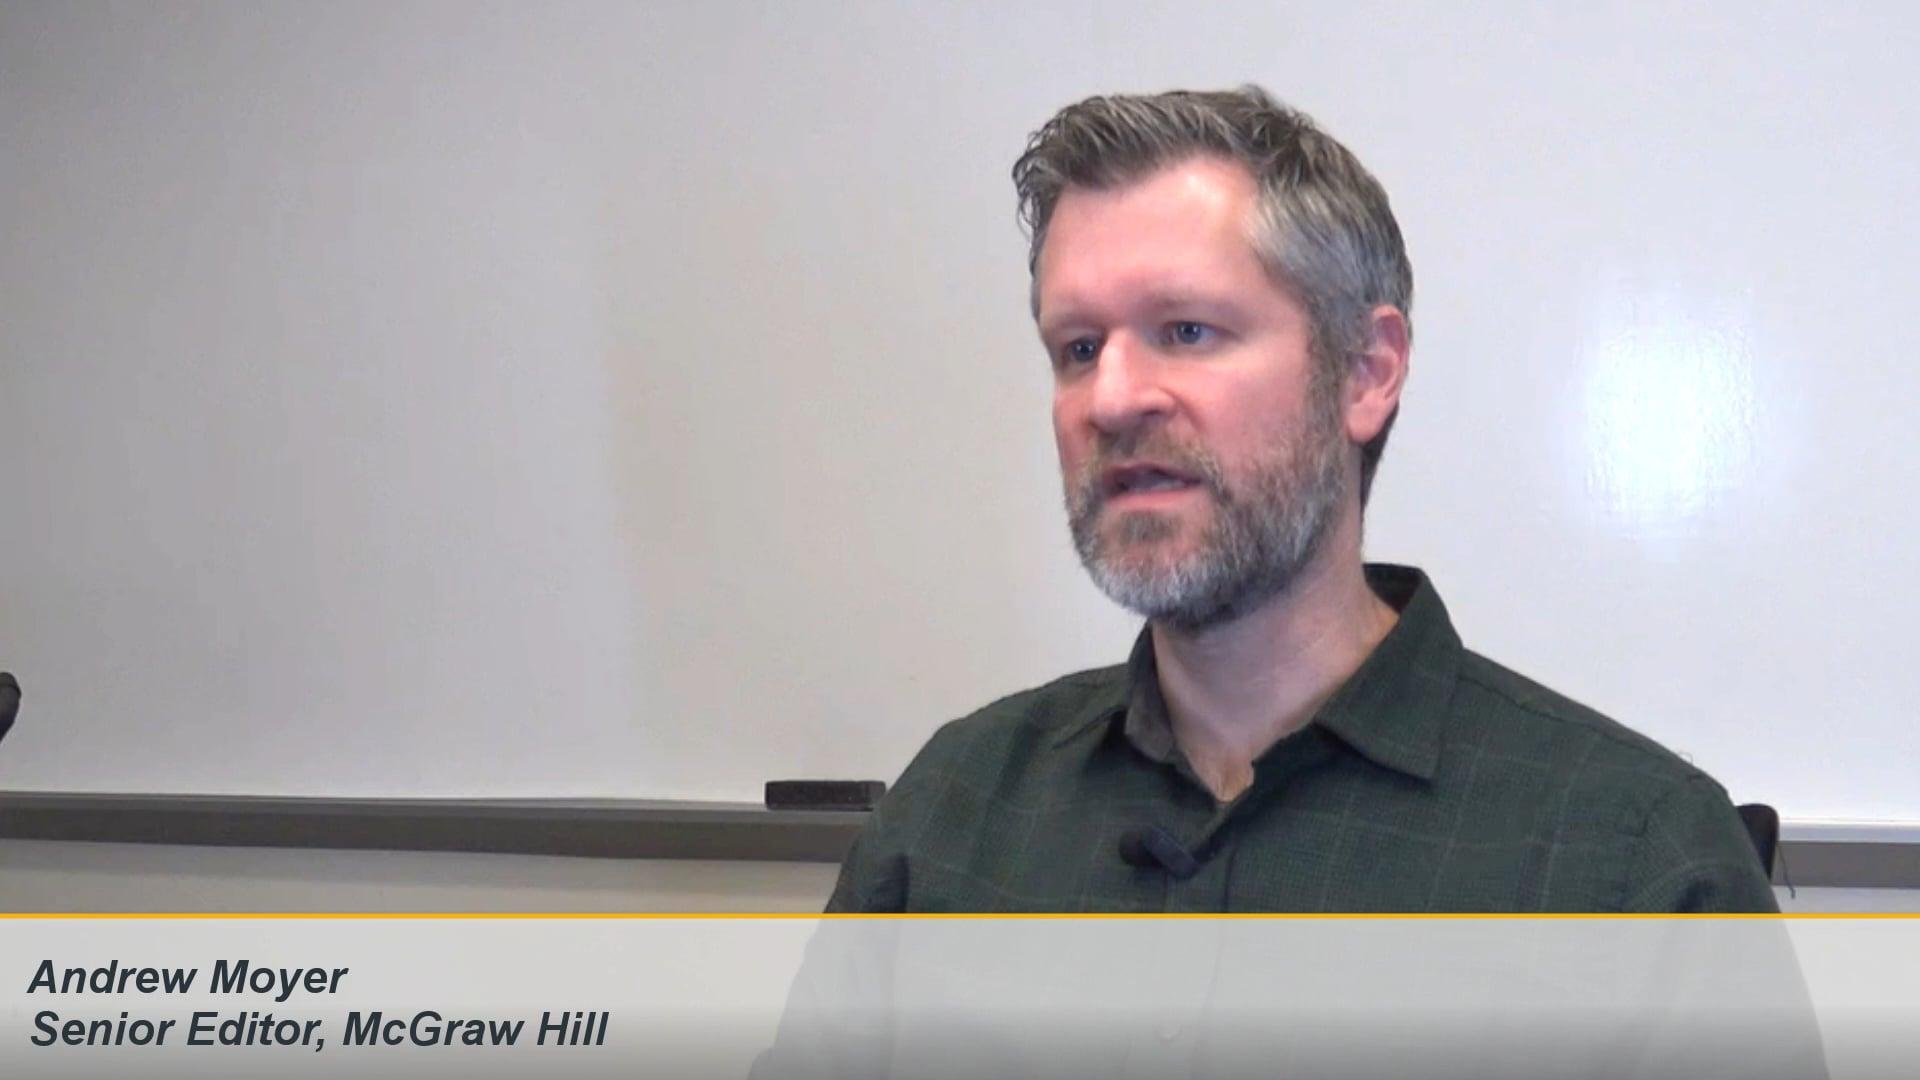 McGraw Hill Testimonial January 2020